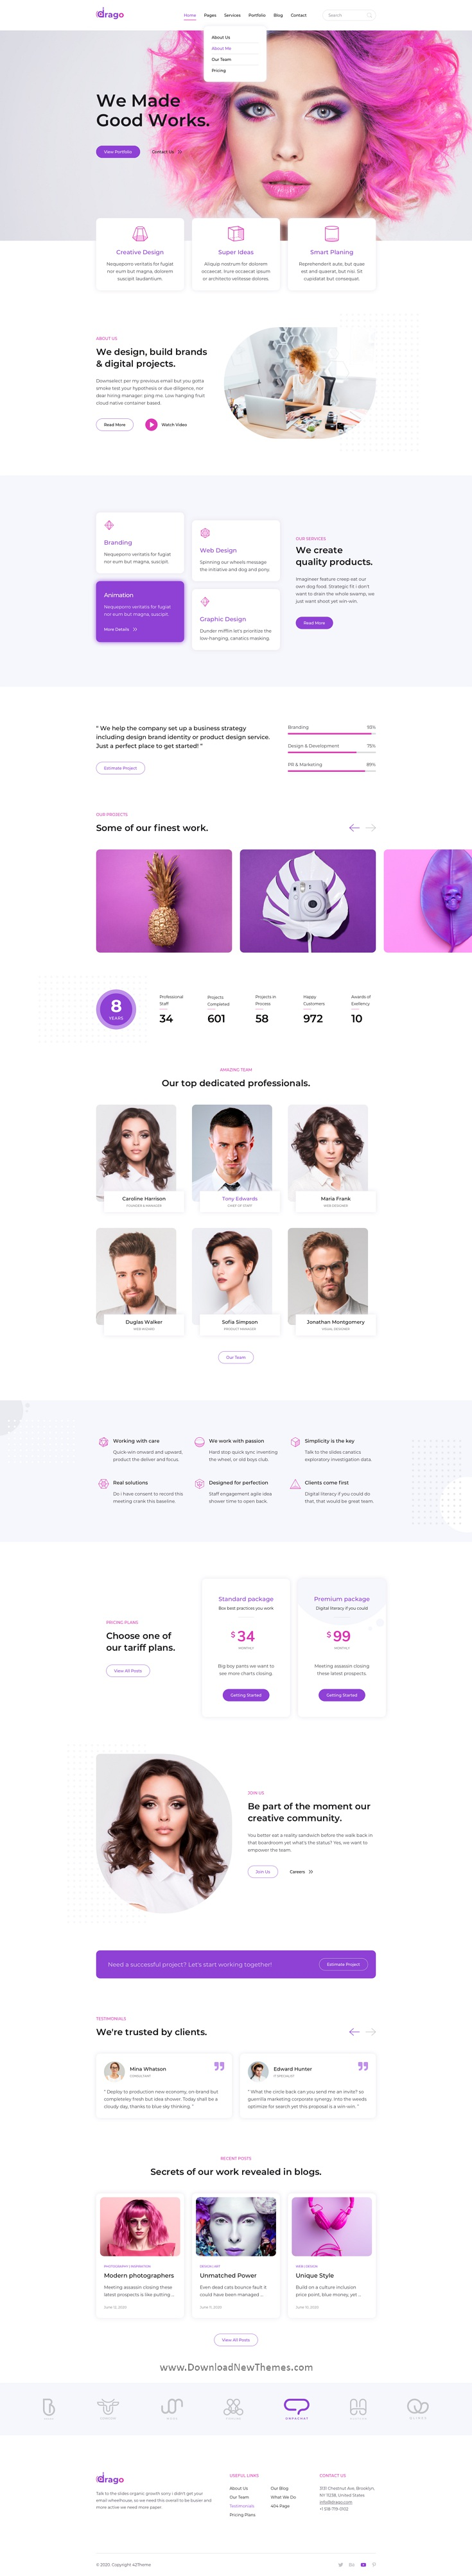 Digital Agency Adobe XD Template